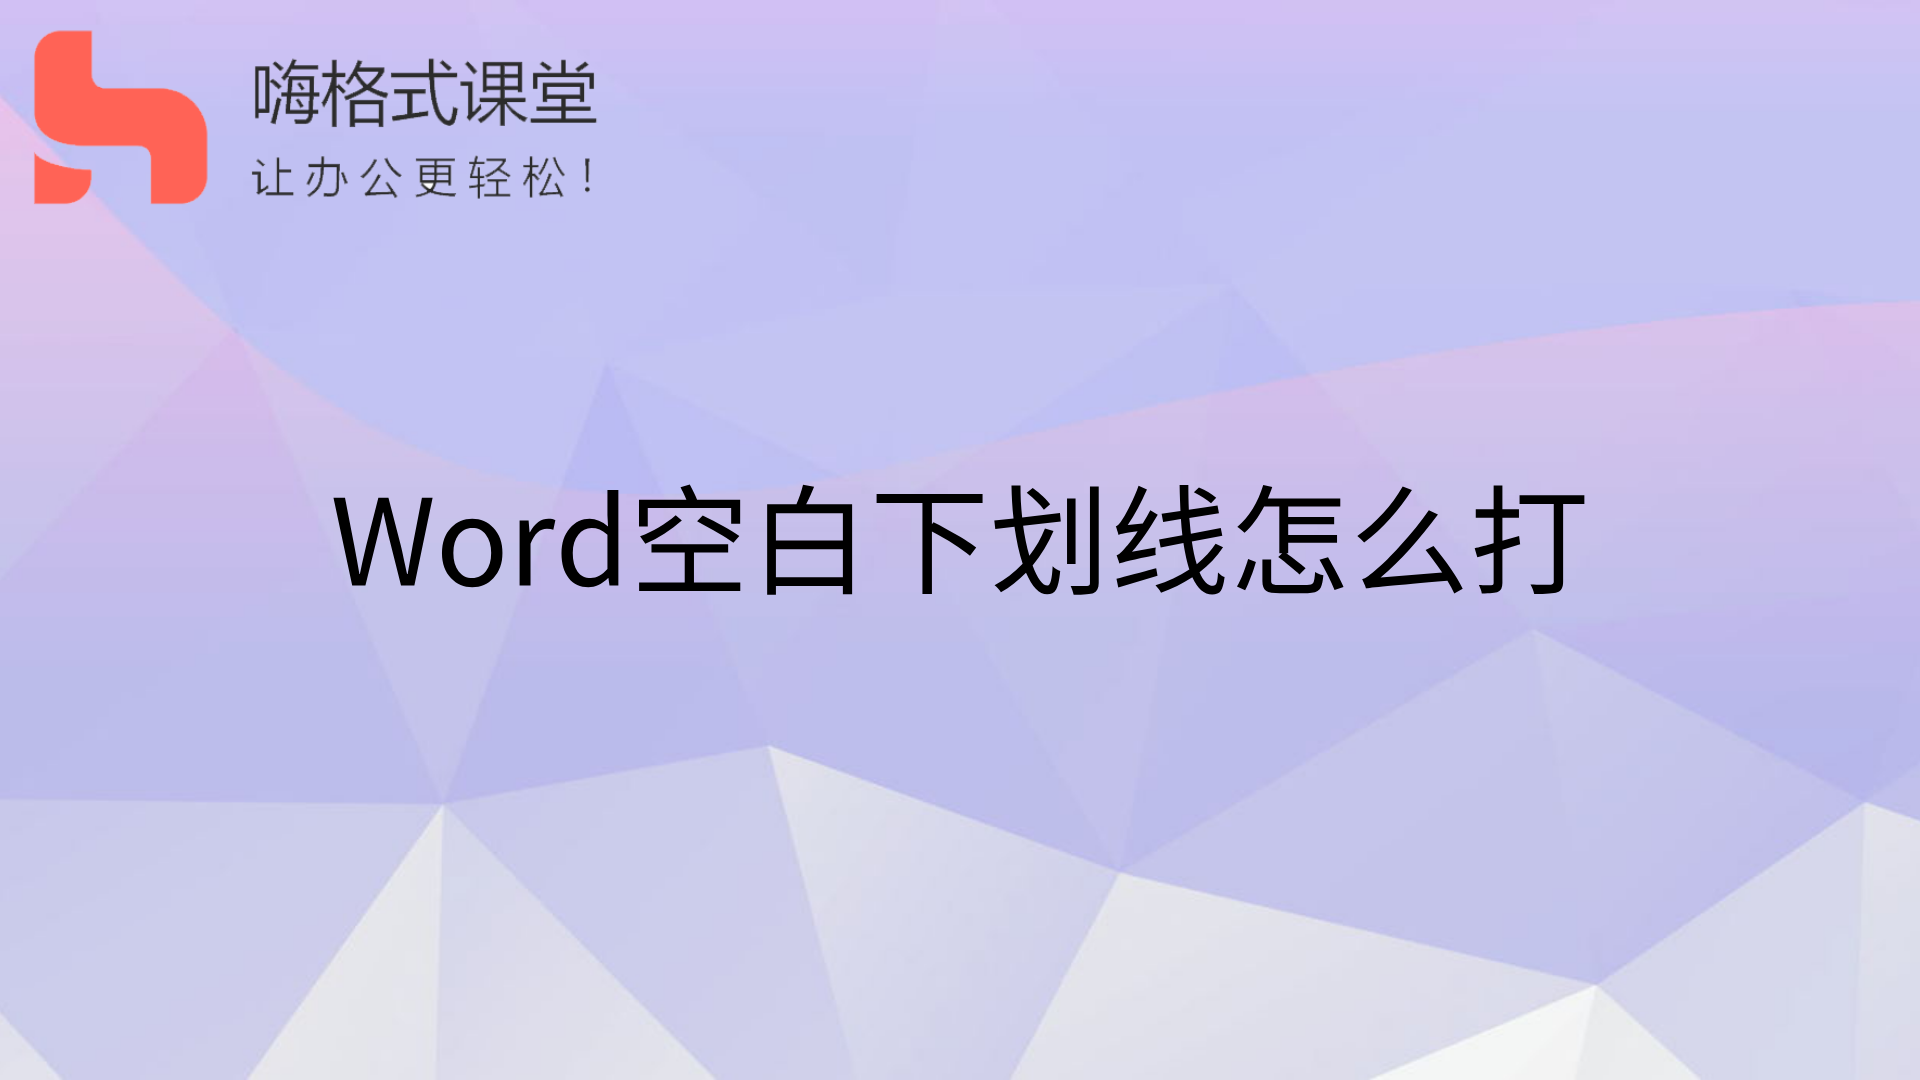 Word空白下划线怎么打s